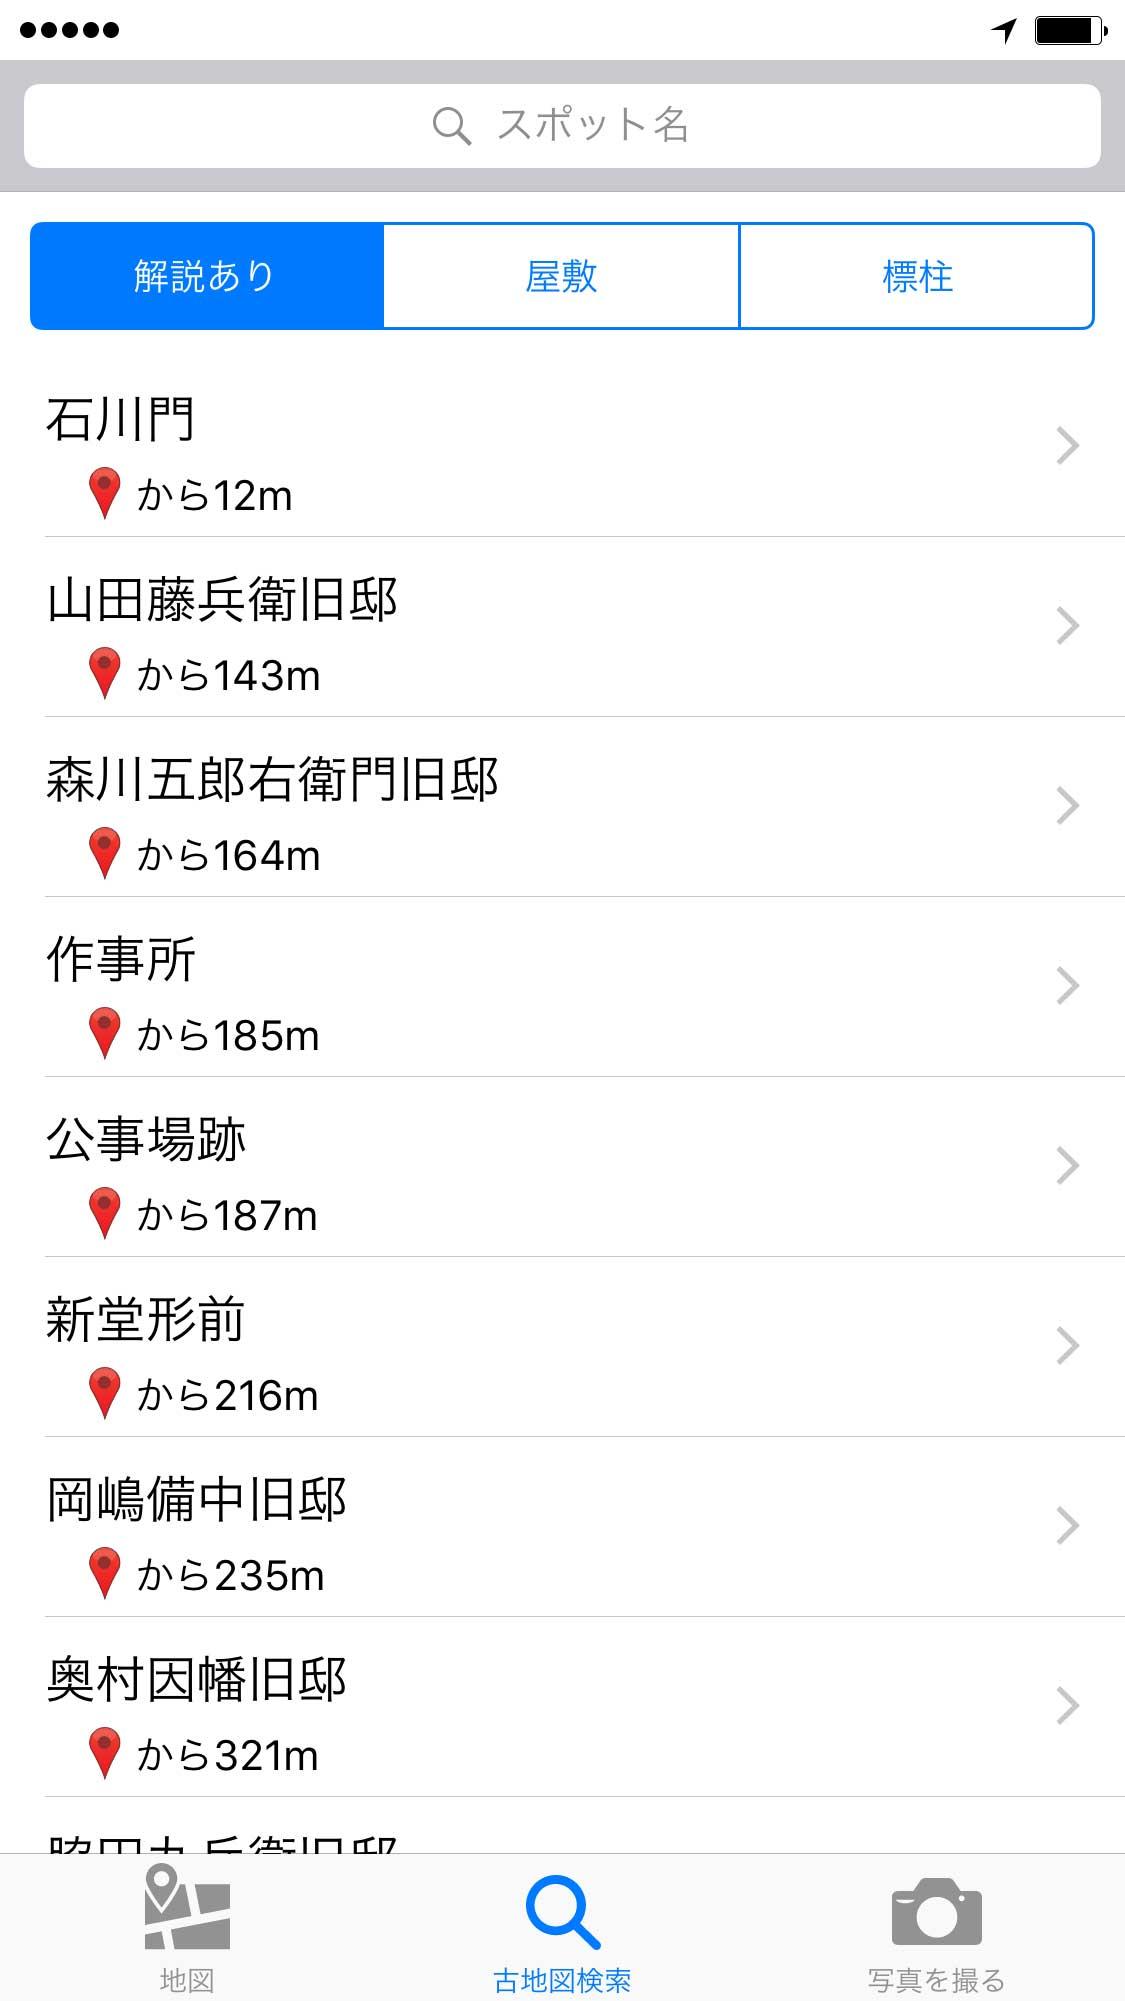 iPhone/iPad App Kokon Kanazawa